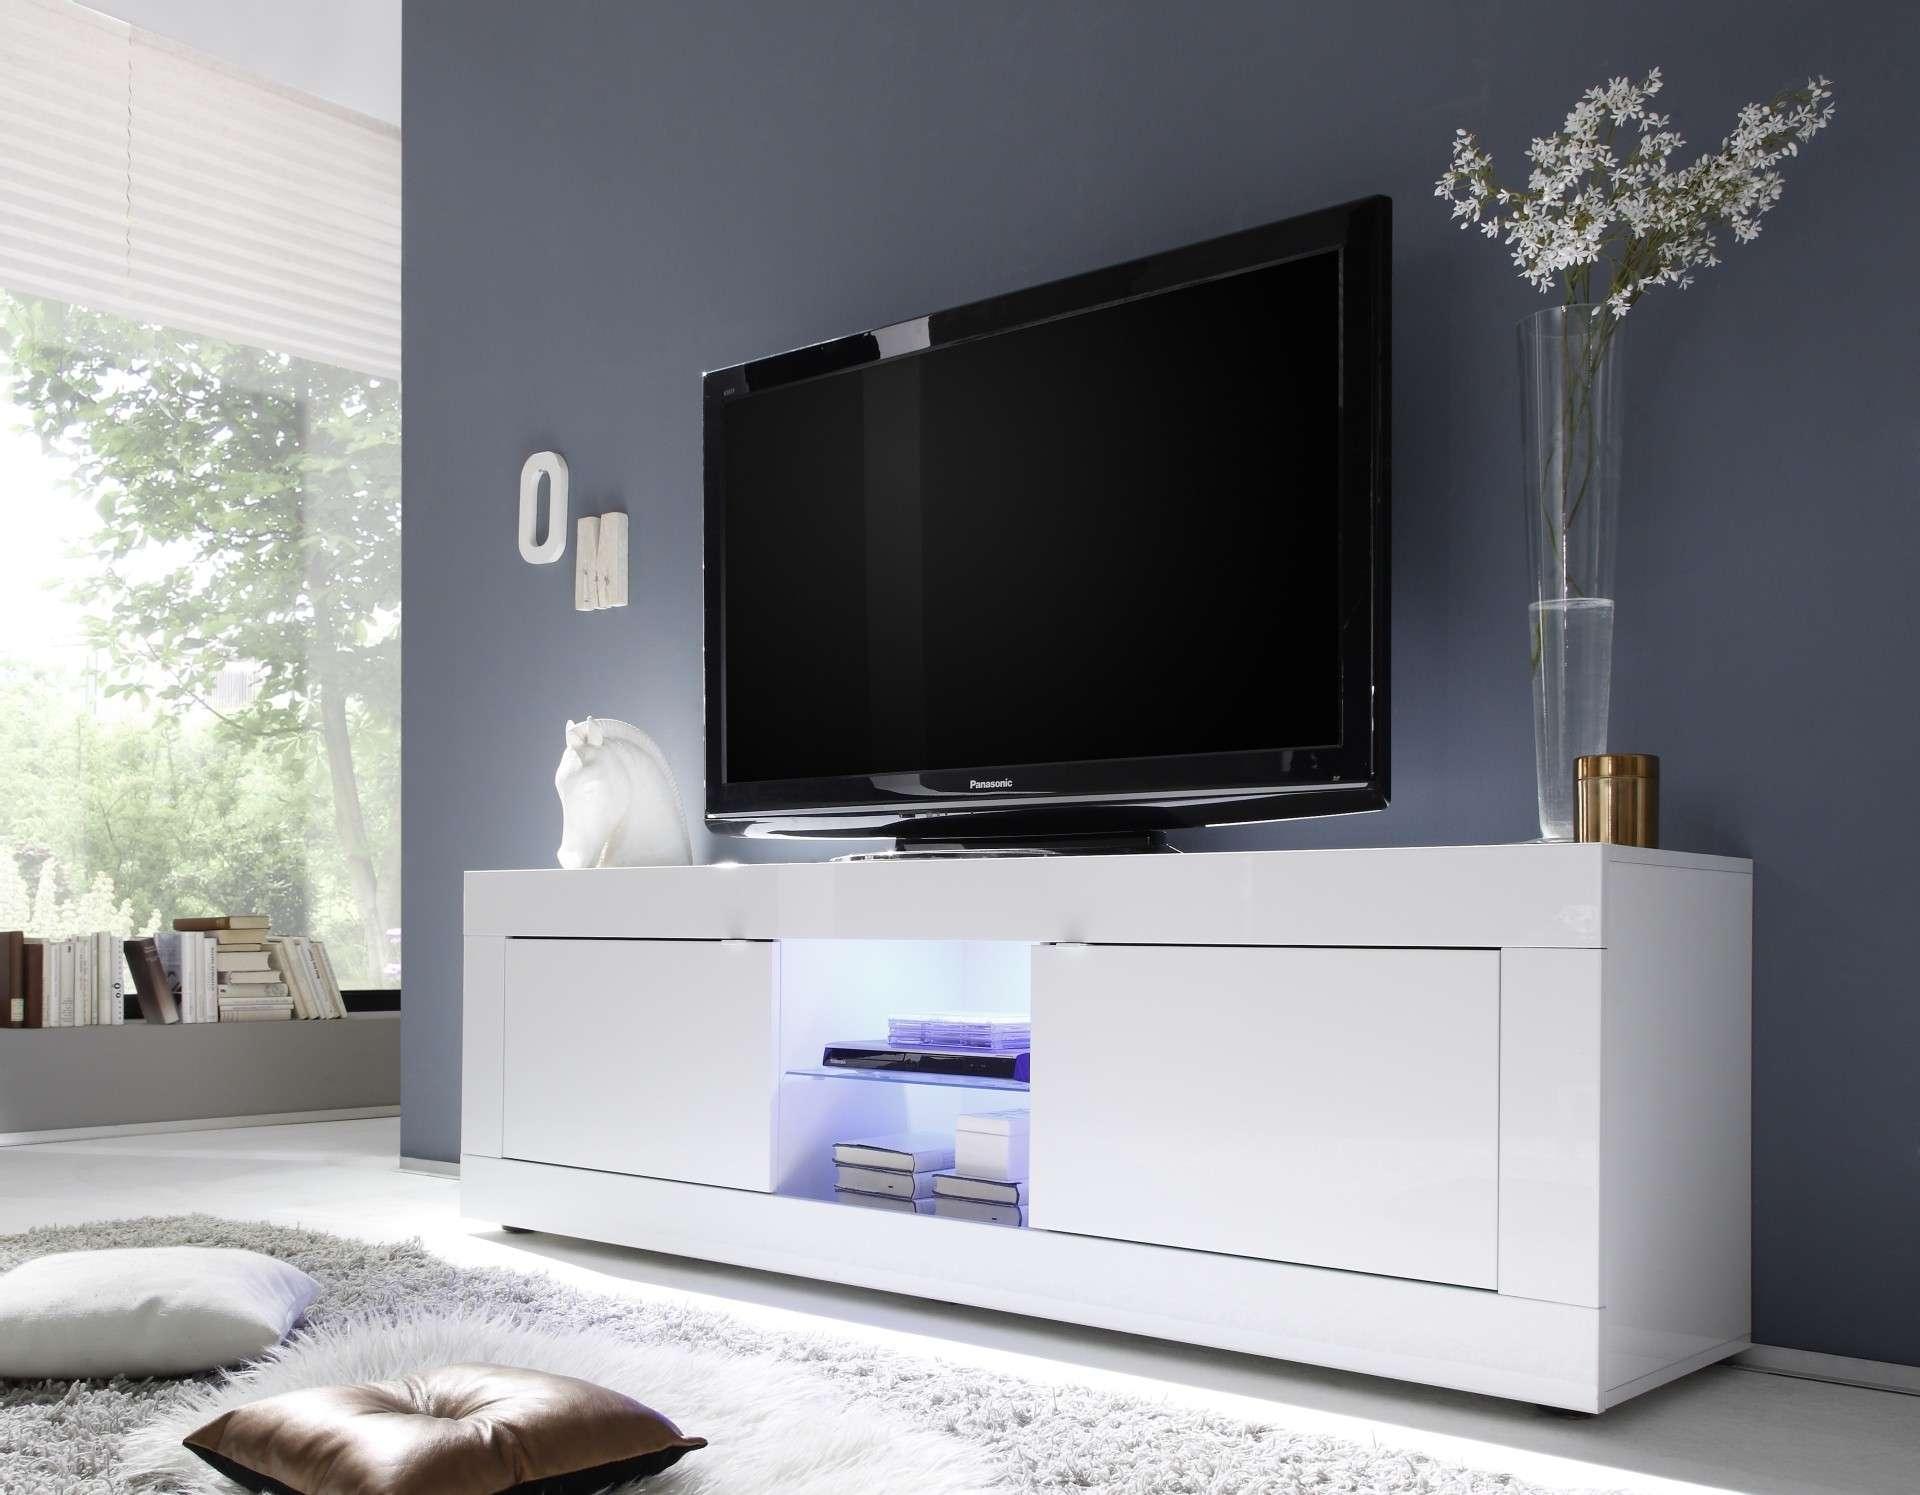 Cream Gloss Tv Cabinet | Centerfordemocracy Pertaining To Cream Gloss Tv Stands (View 3 of 15)